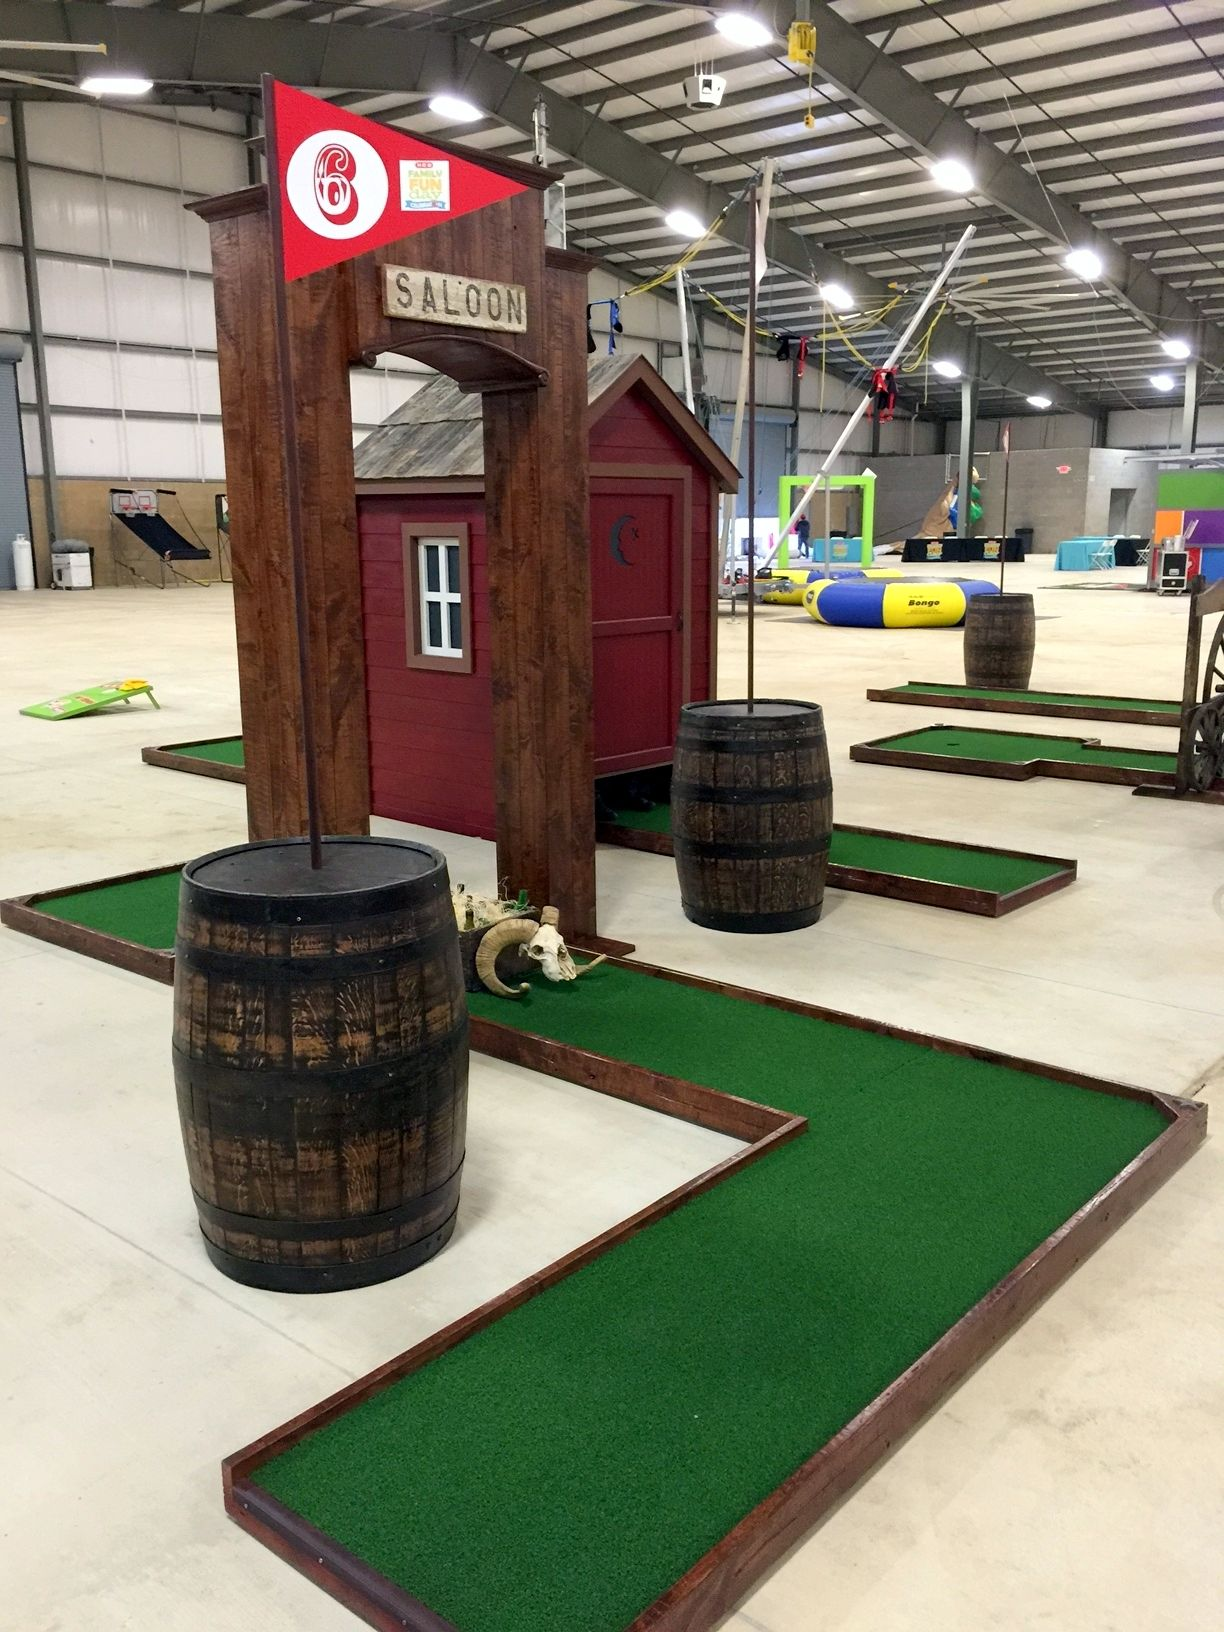 Western barrel themed hole for 9hole miniature golf